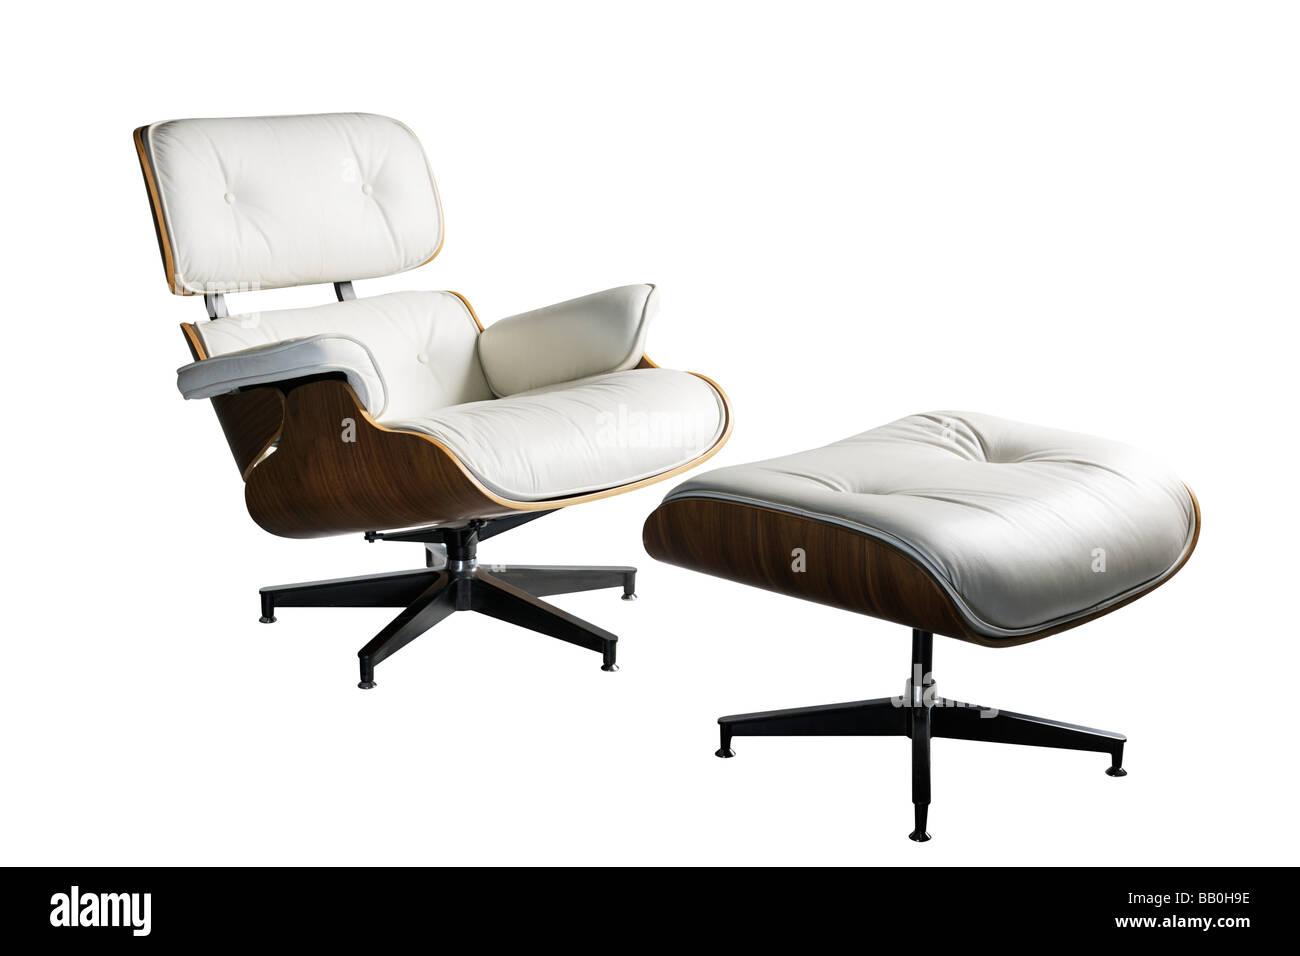 charles ray eames designer leder stuhl lounge und ottoman hocker stockfoto bild 23985178 alamy. Black Bedroom Furniture Sets. Home Design Ideas